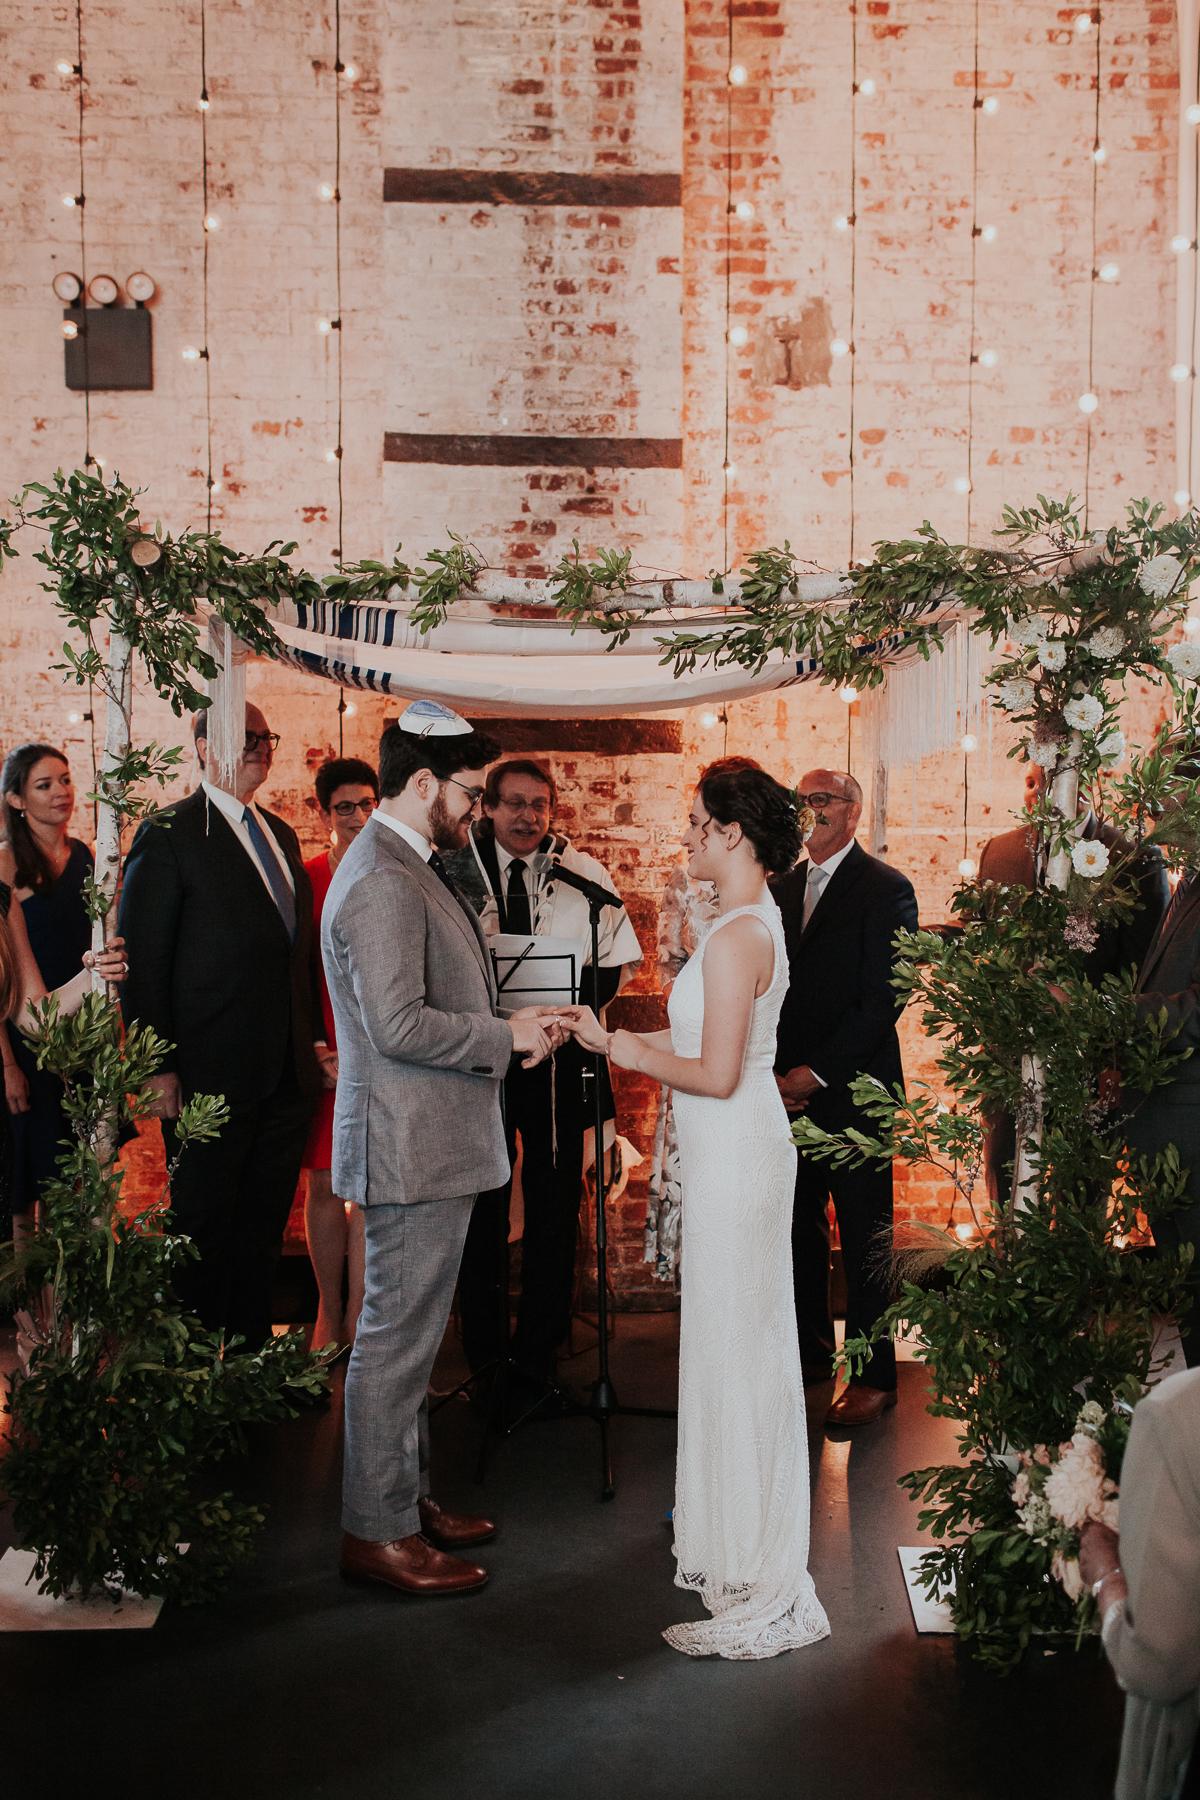 The-Green-Building-Jewish-Wedding-NYC-Brooklyn-Documentary-Wedding-Photographer-33.jpg